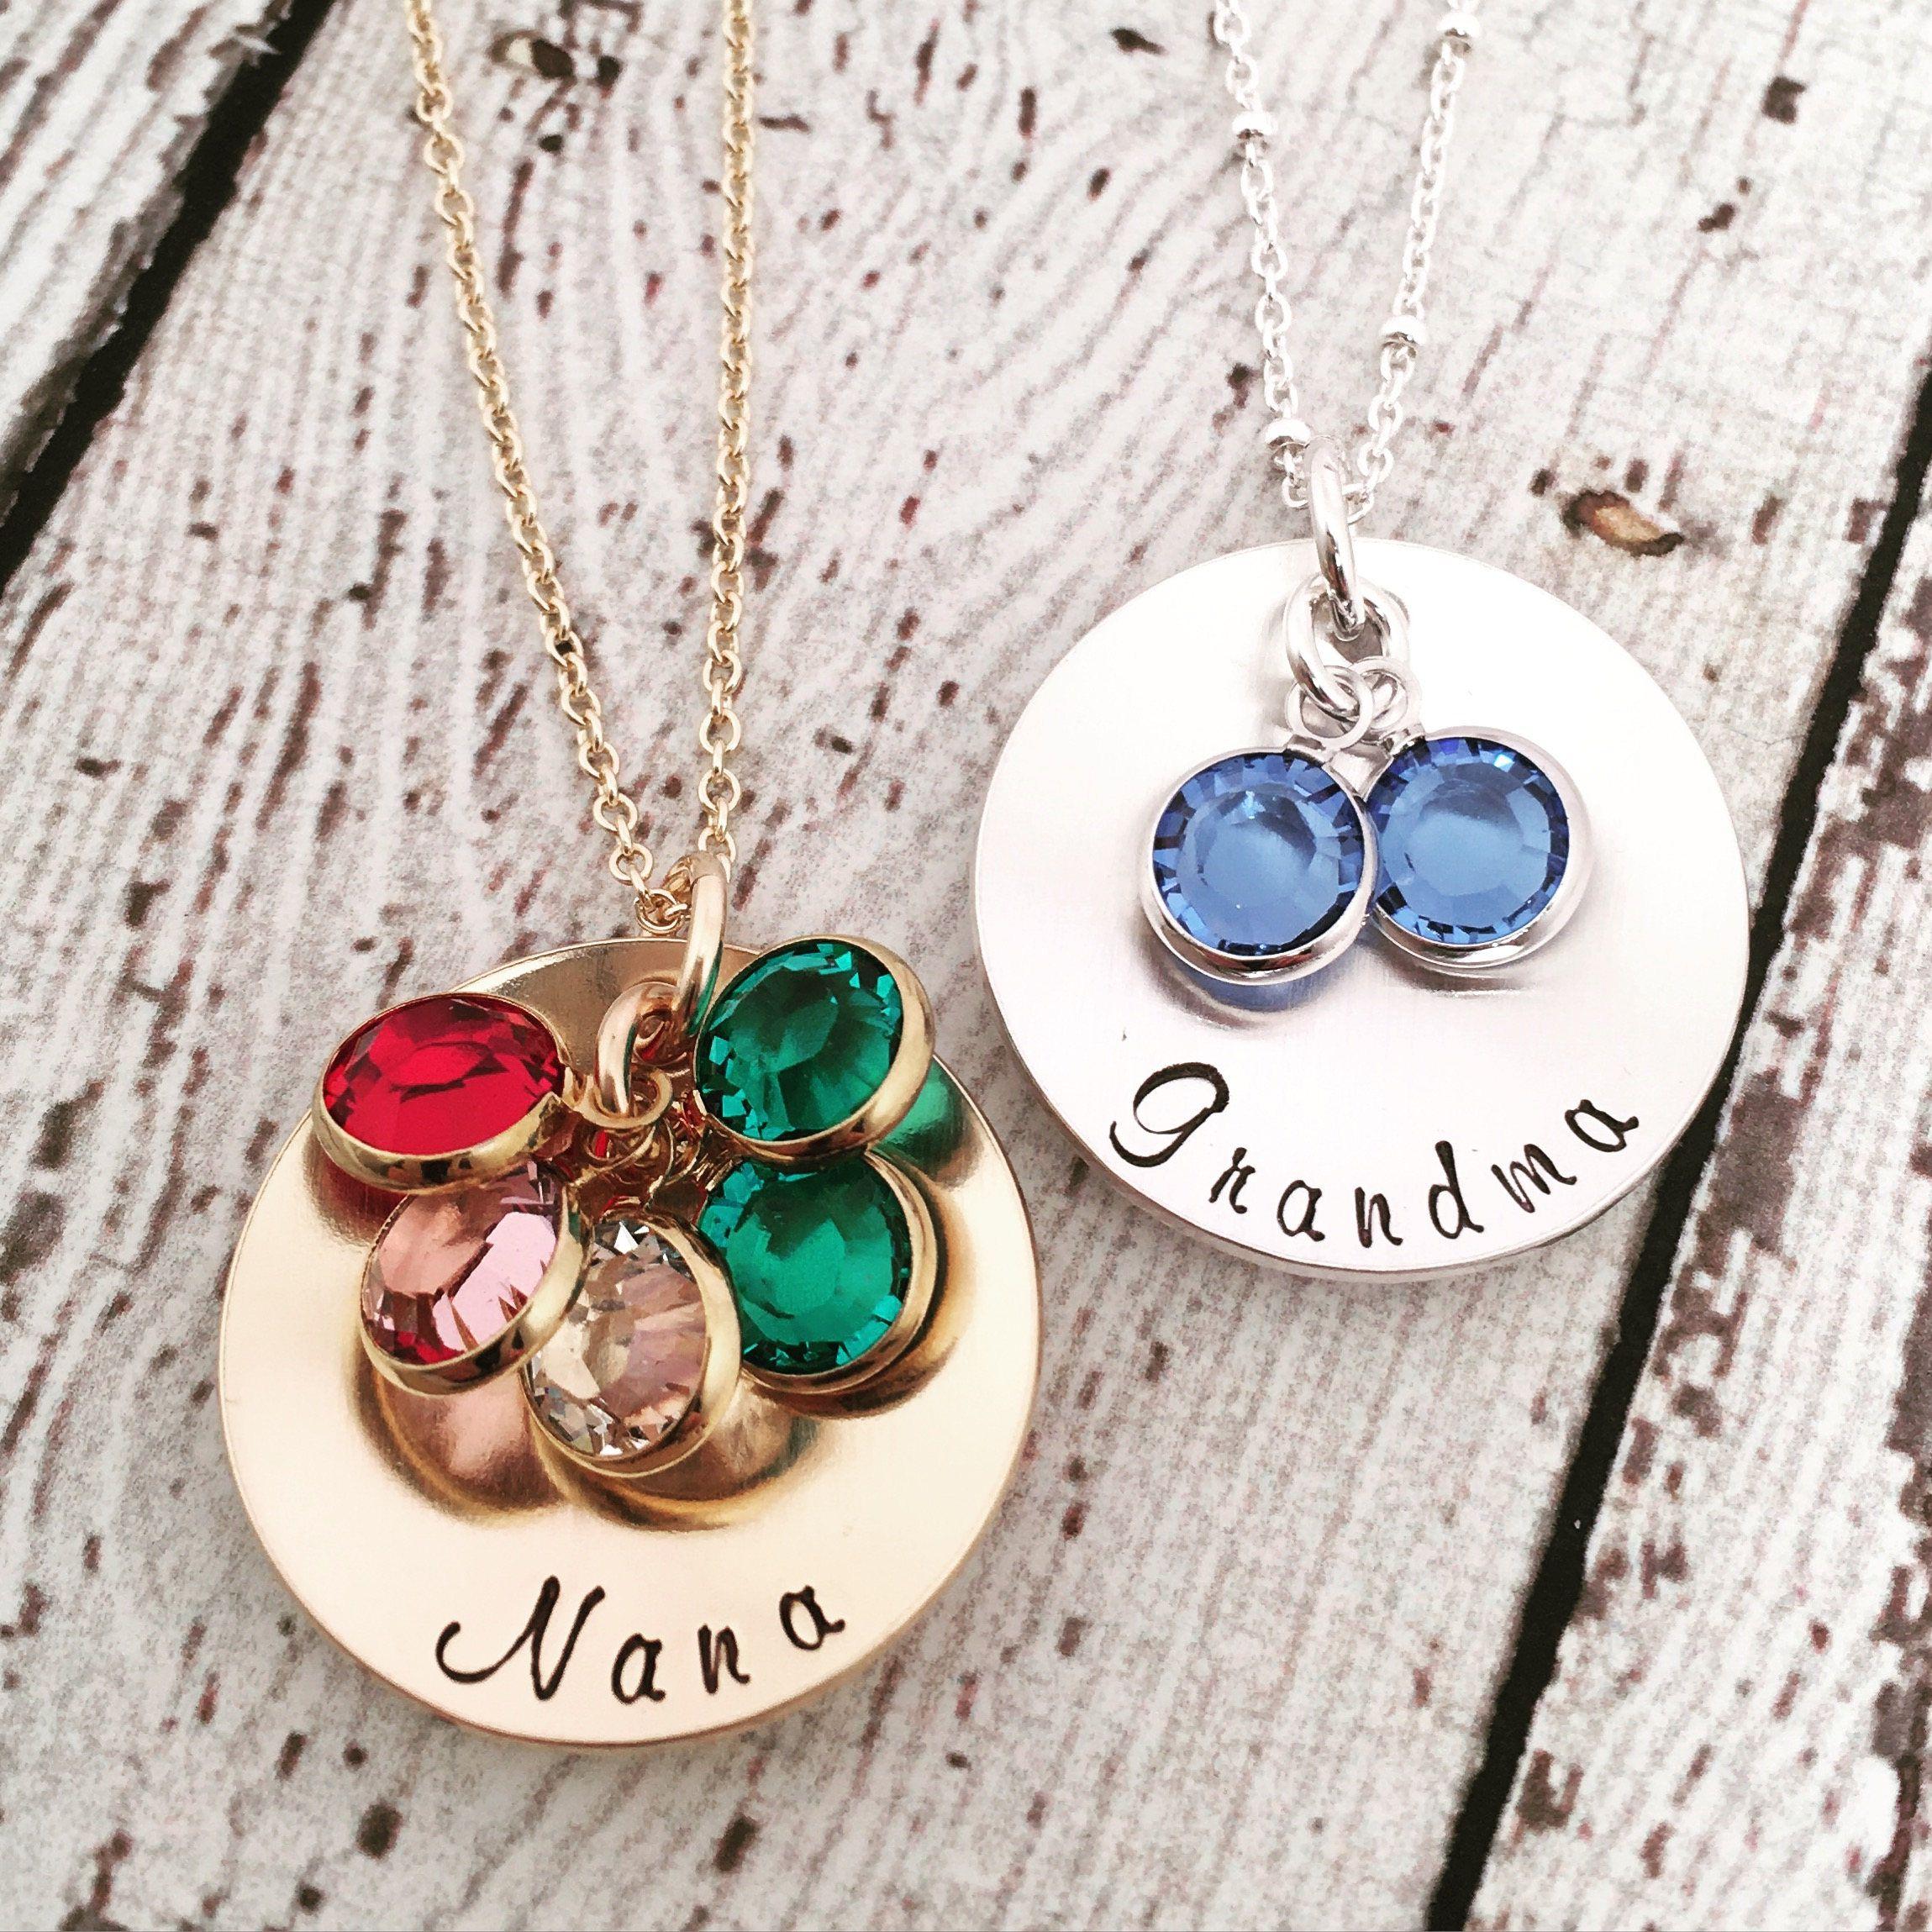 Birthstone necklace for grandma nana necklace